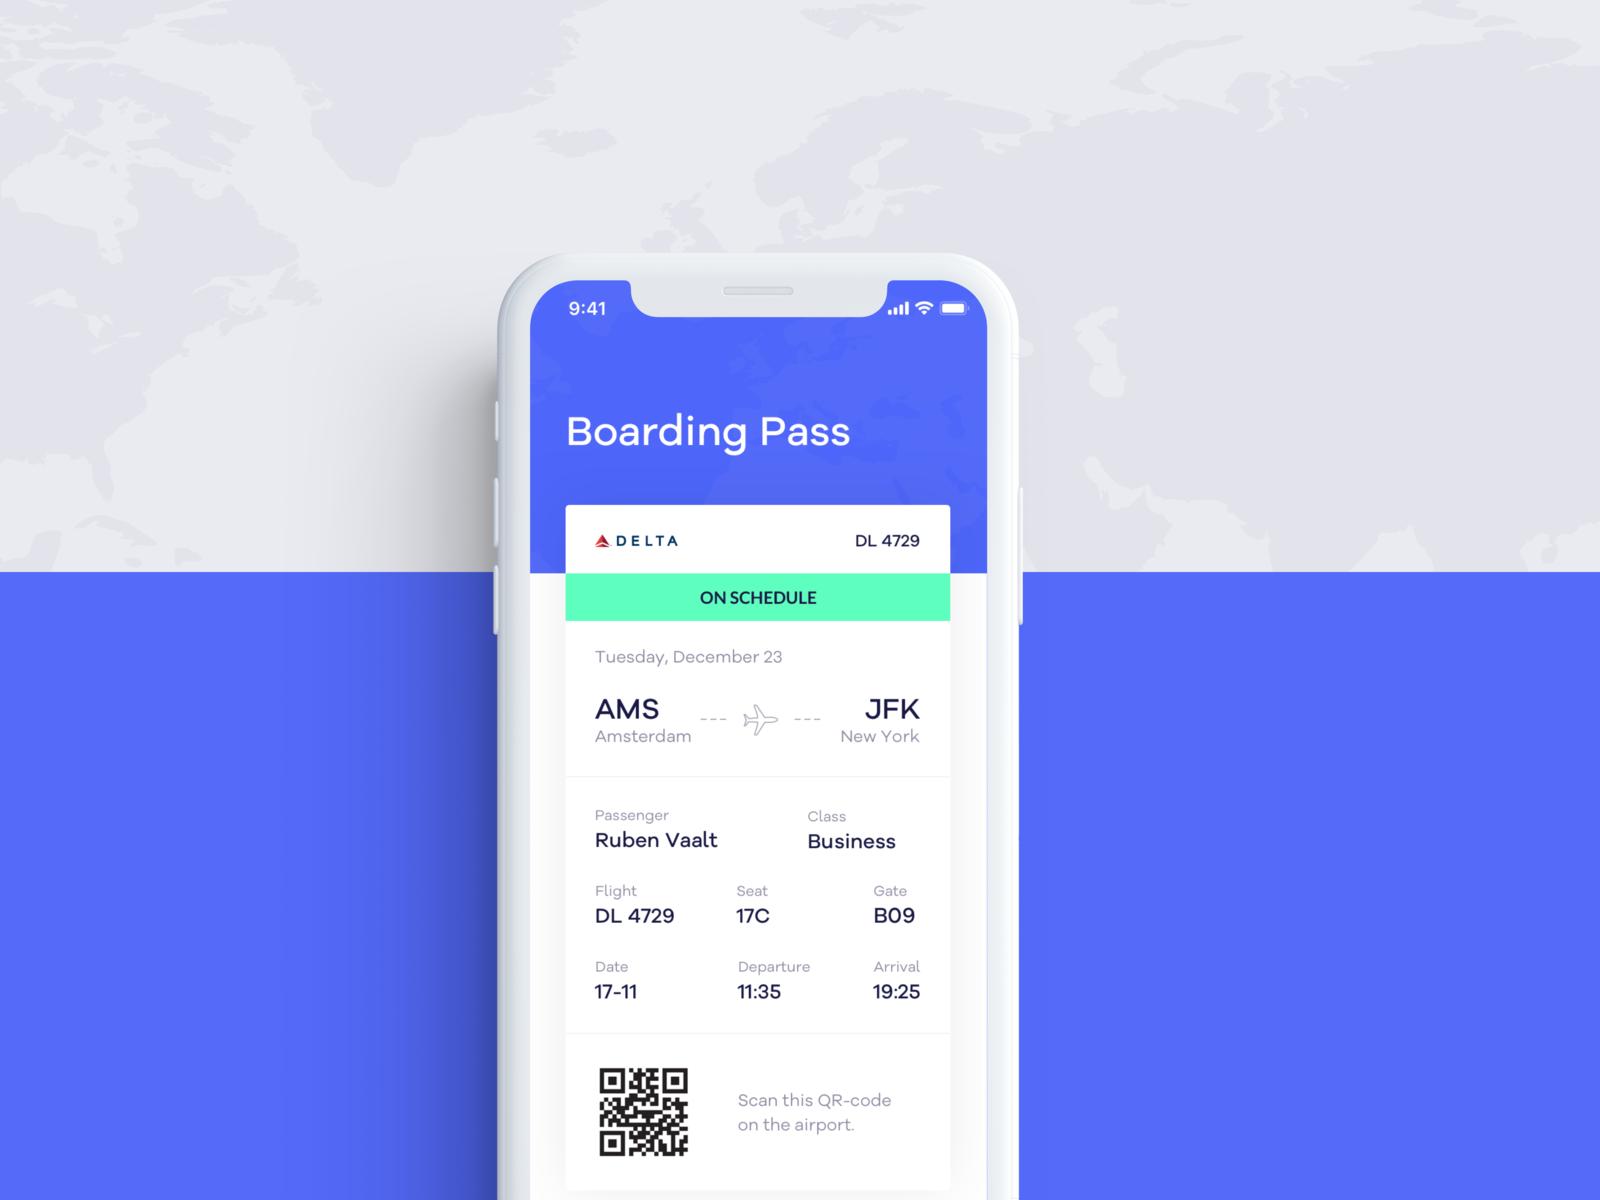 🛫 Flight Booking App - Boarding Pass flight app flight search boarding pass flight iphone apple ios app ios app uxdesign uidesign concept web design clean photoshop ui ux sketch design